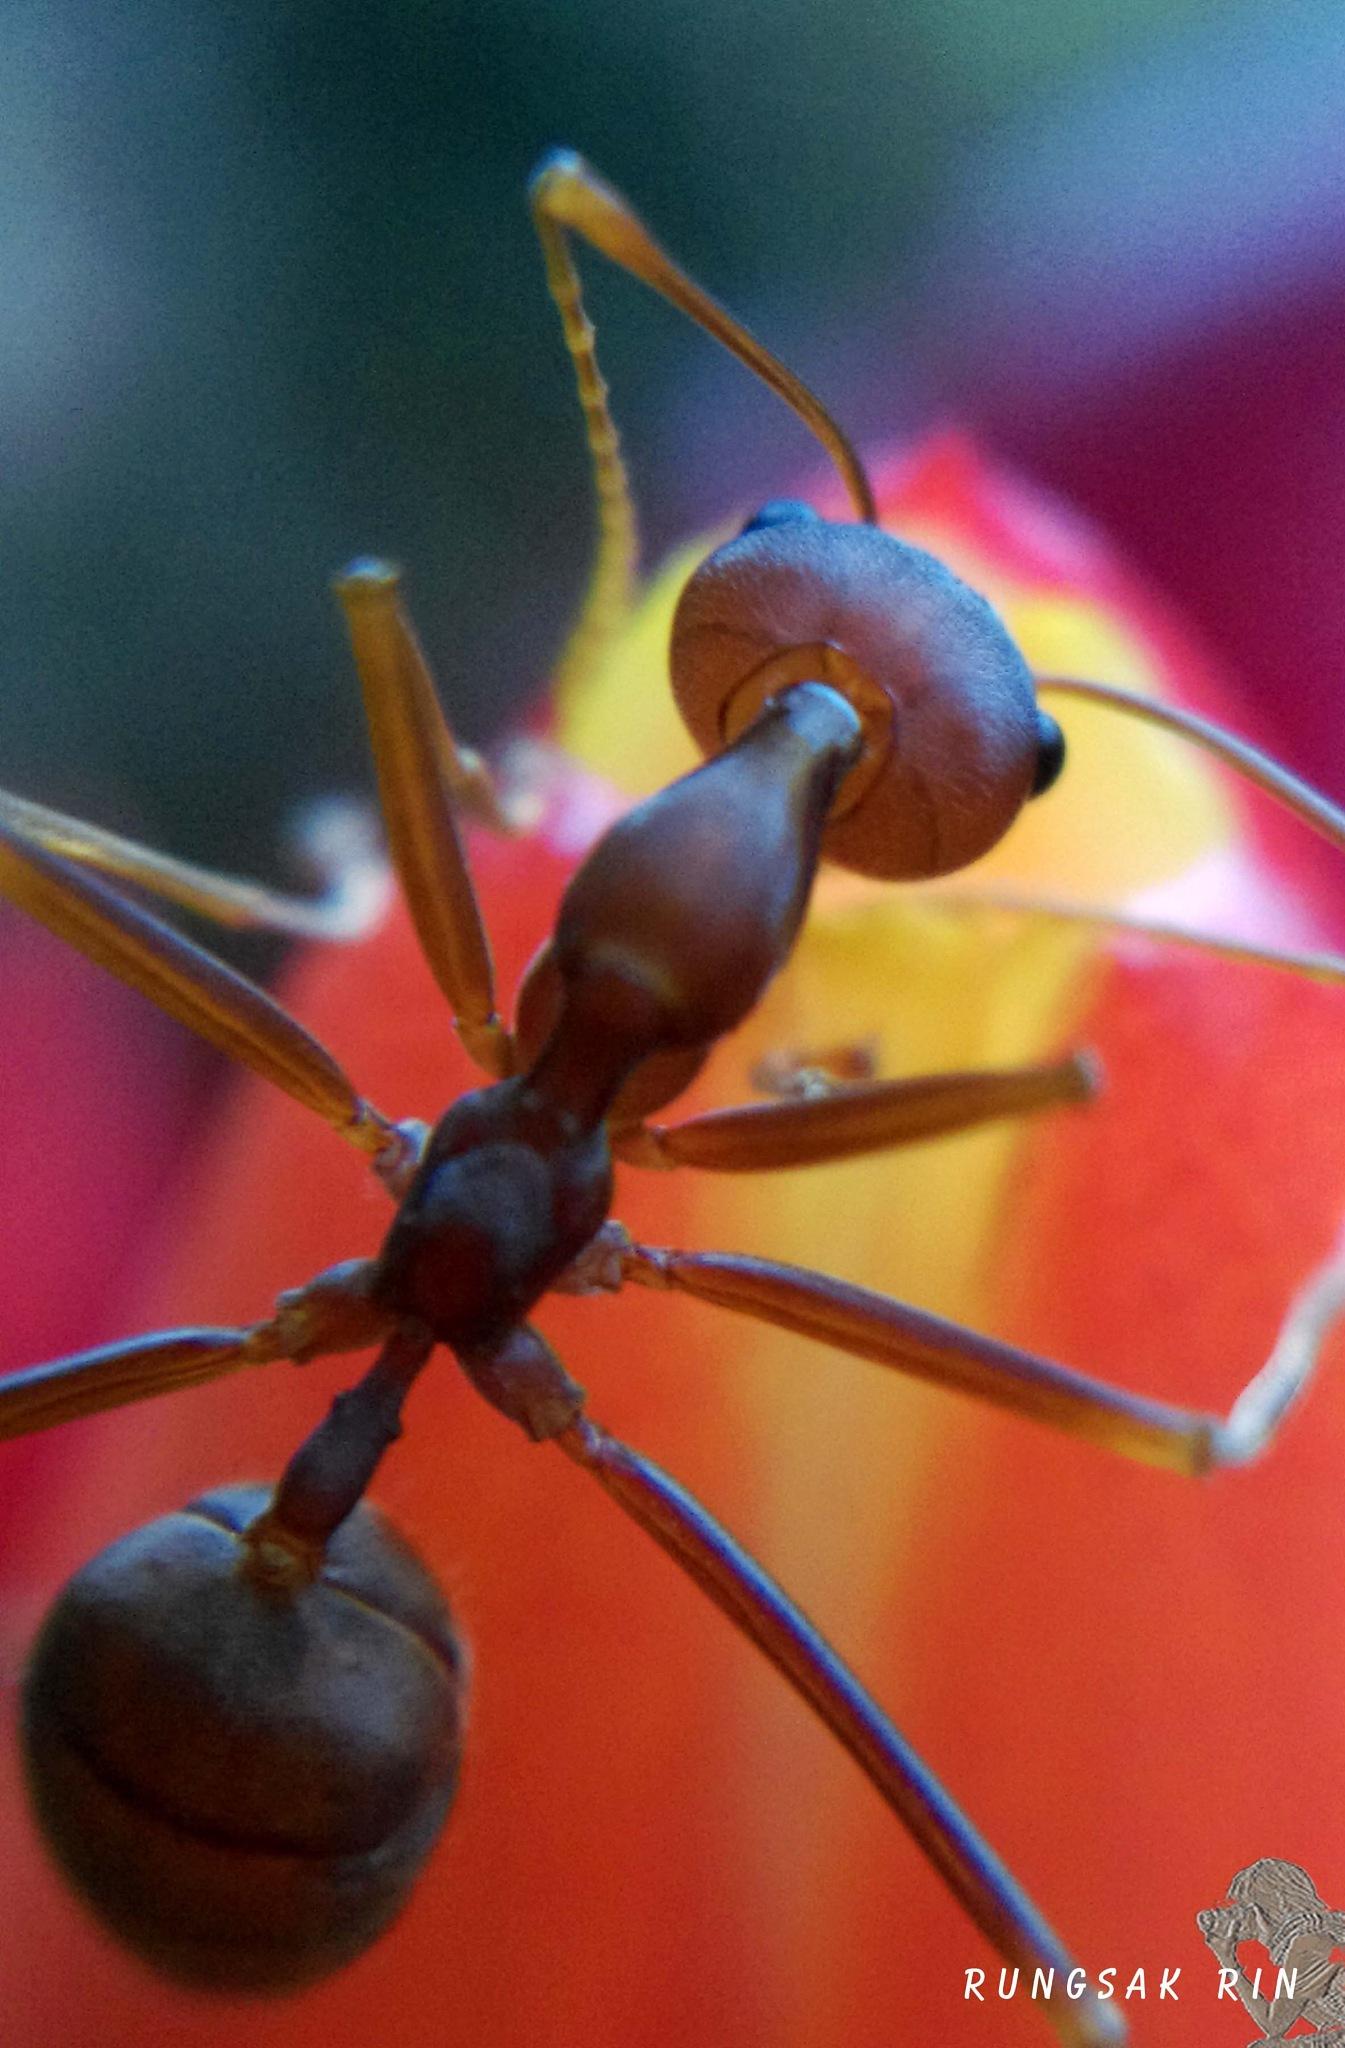 Ant by Rungsak Rintharasri